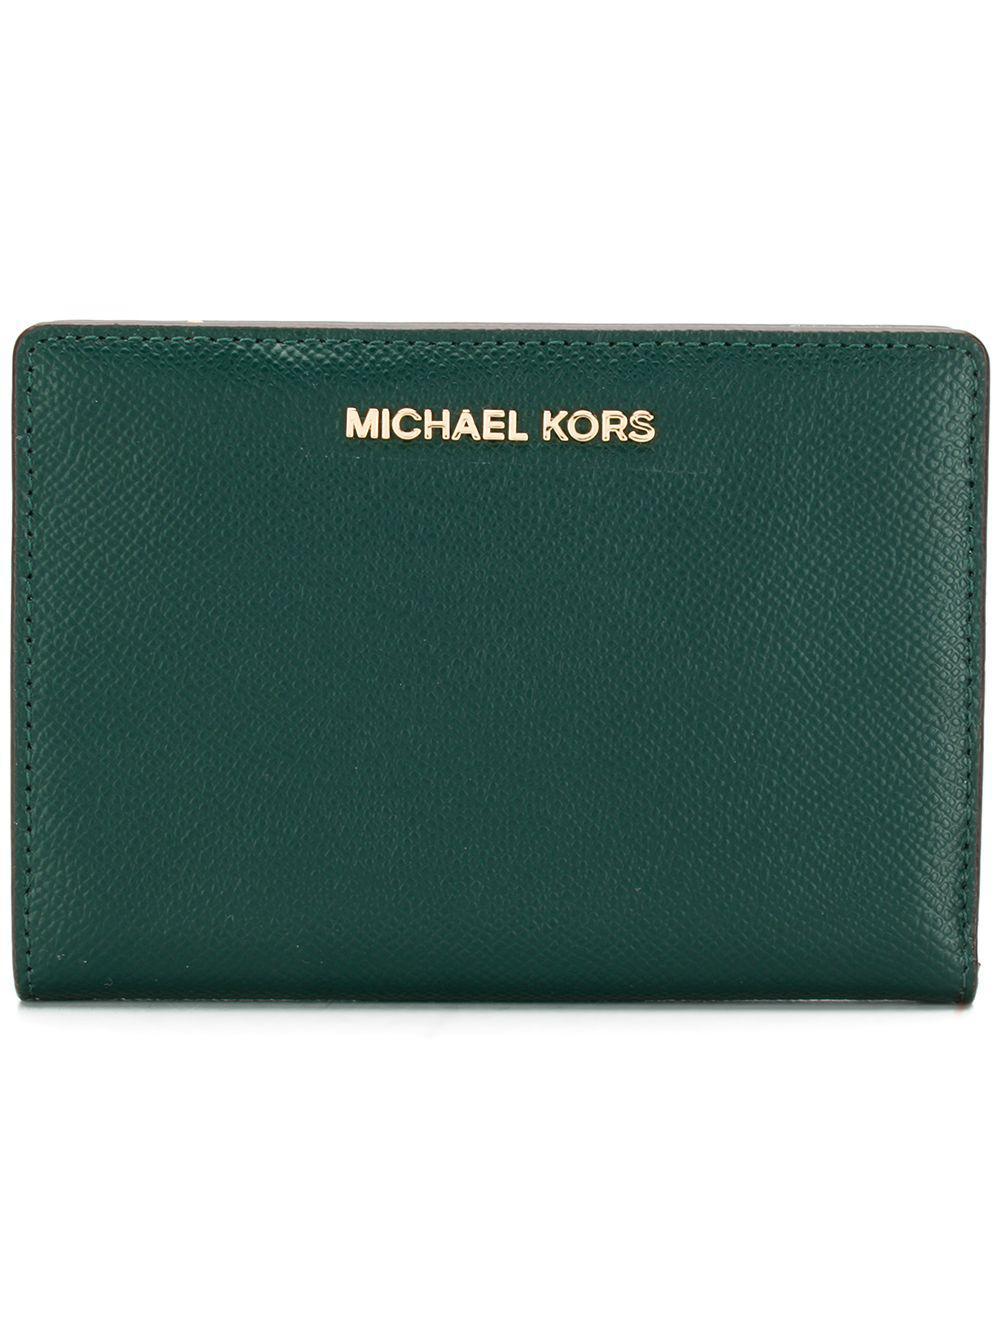 fff2b6a29075 MICHAEL Michael Kors Jet Set Slim Wallet in Green - Save 1% - Lyst